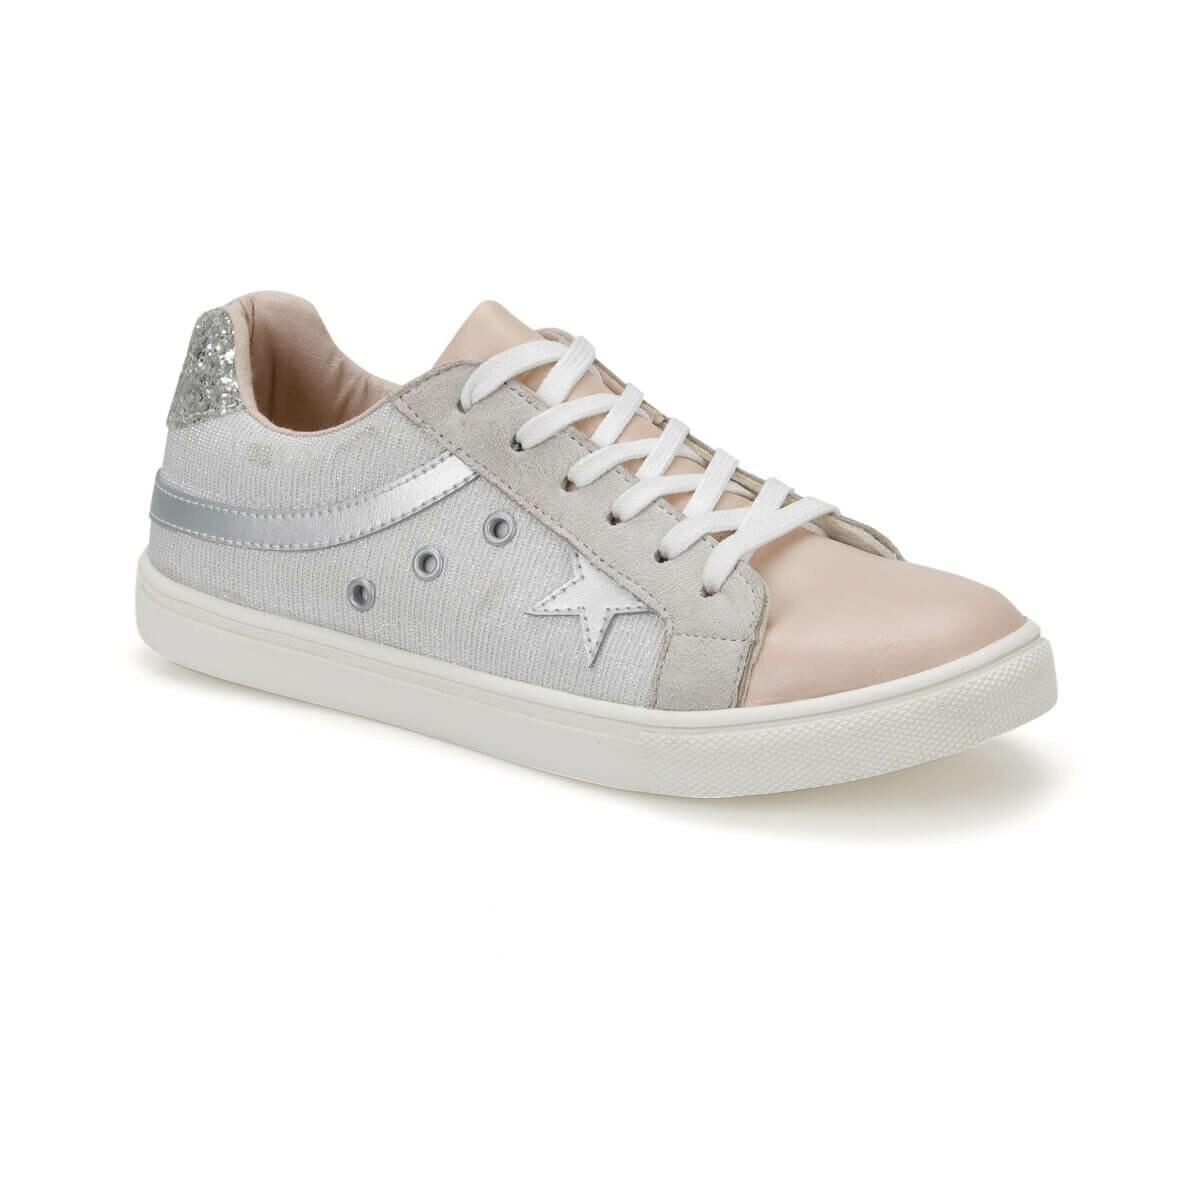 FLO CS19055 Powder Women 'S Sneaker Shoes Art Bella